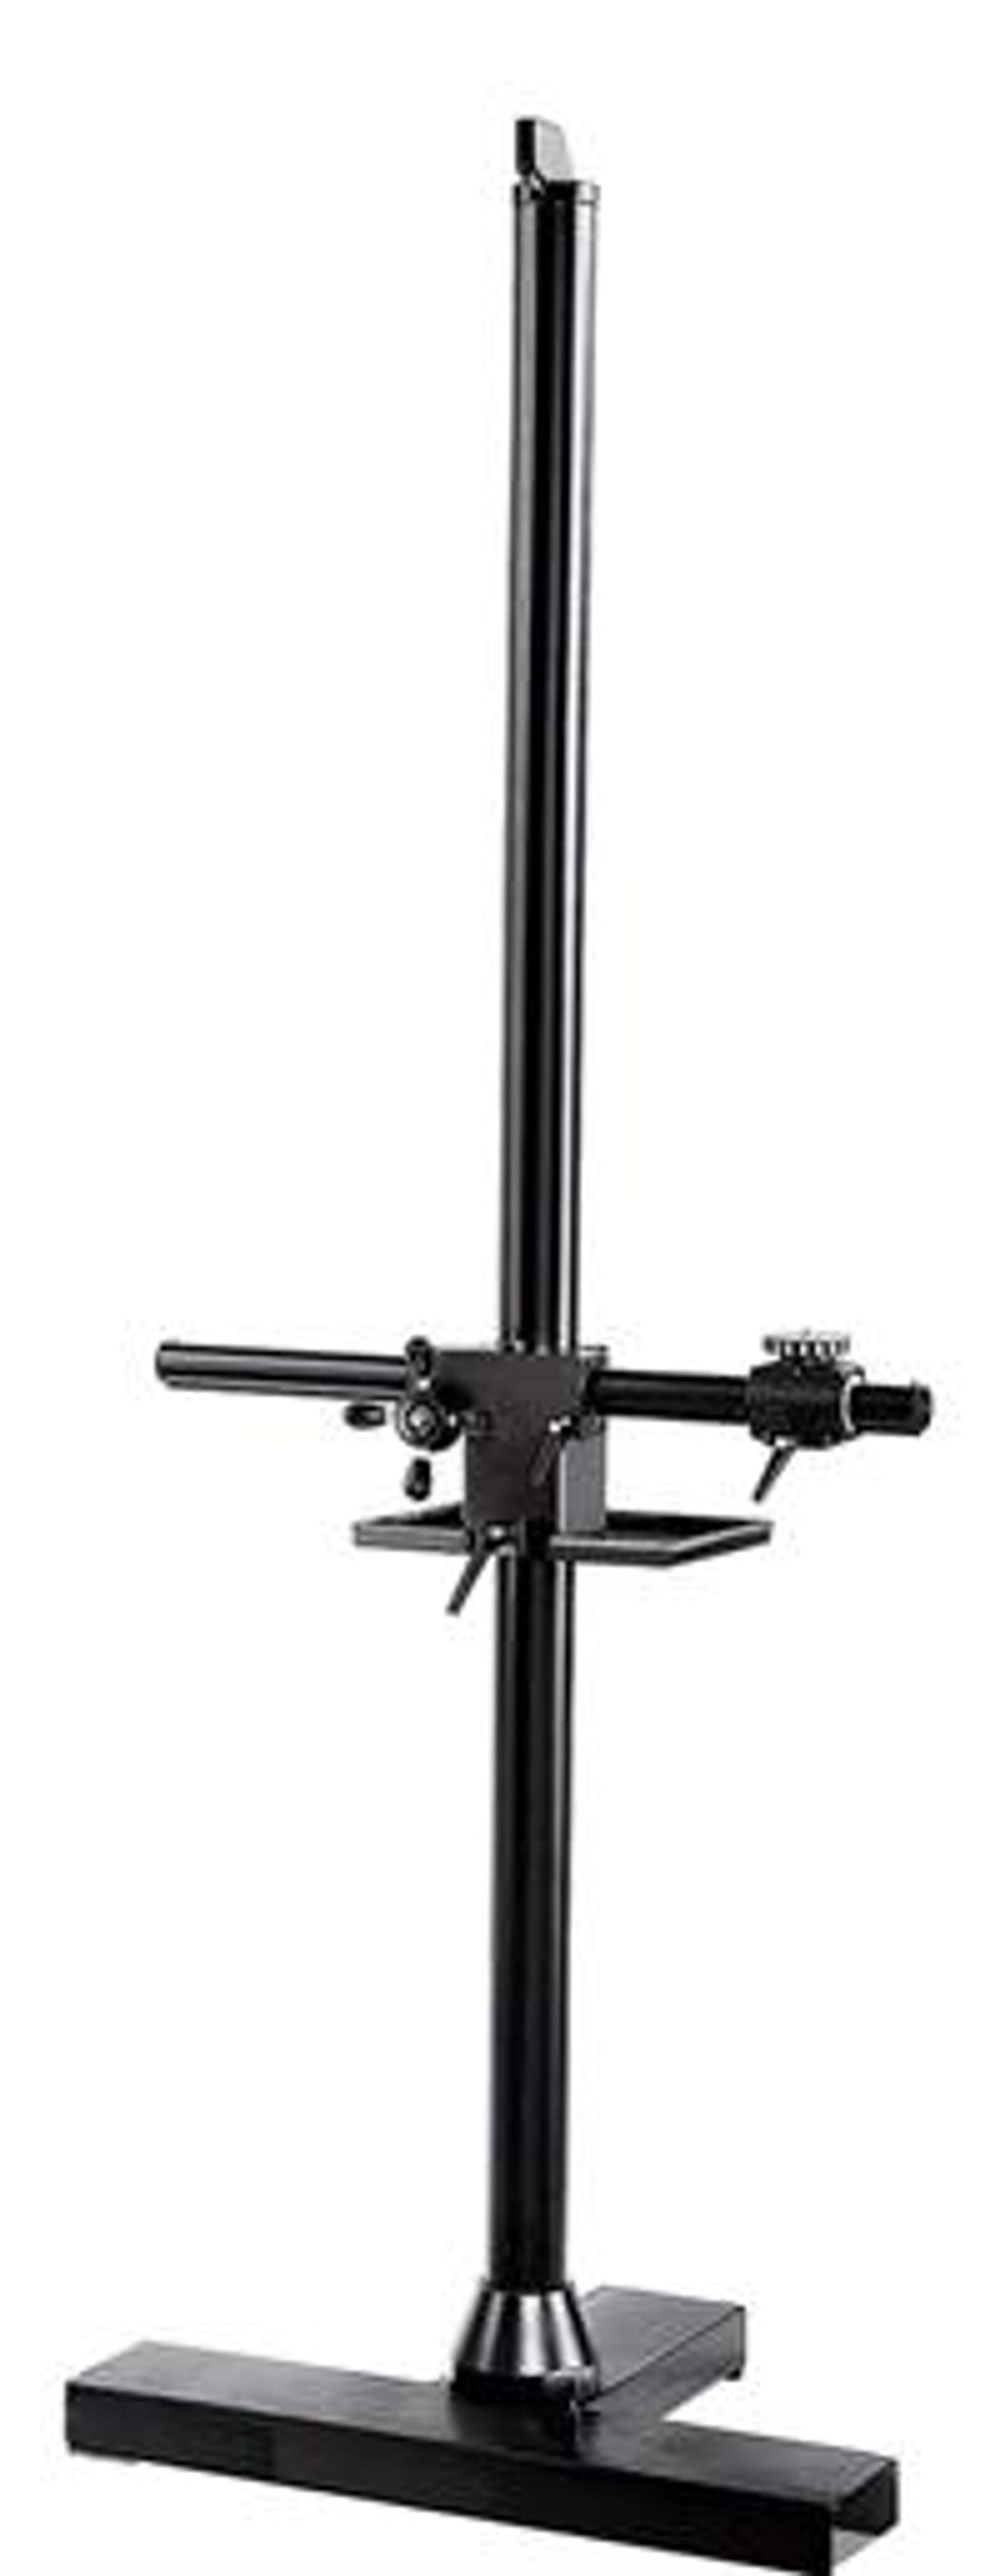 Manfrotto M816, produktguidens dyreste stativ. Prisen er kr 23 441,-